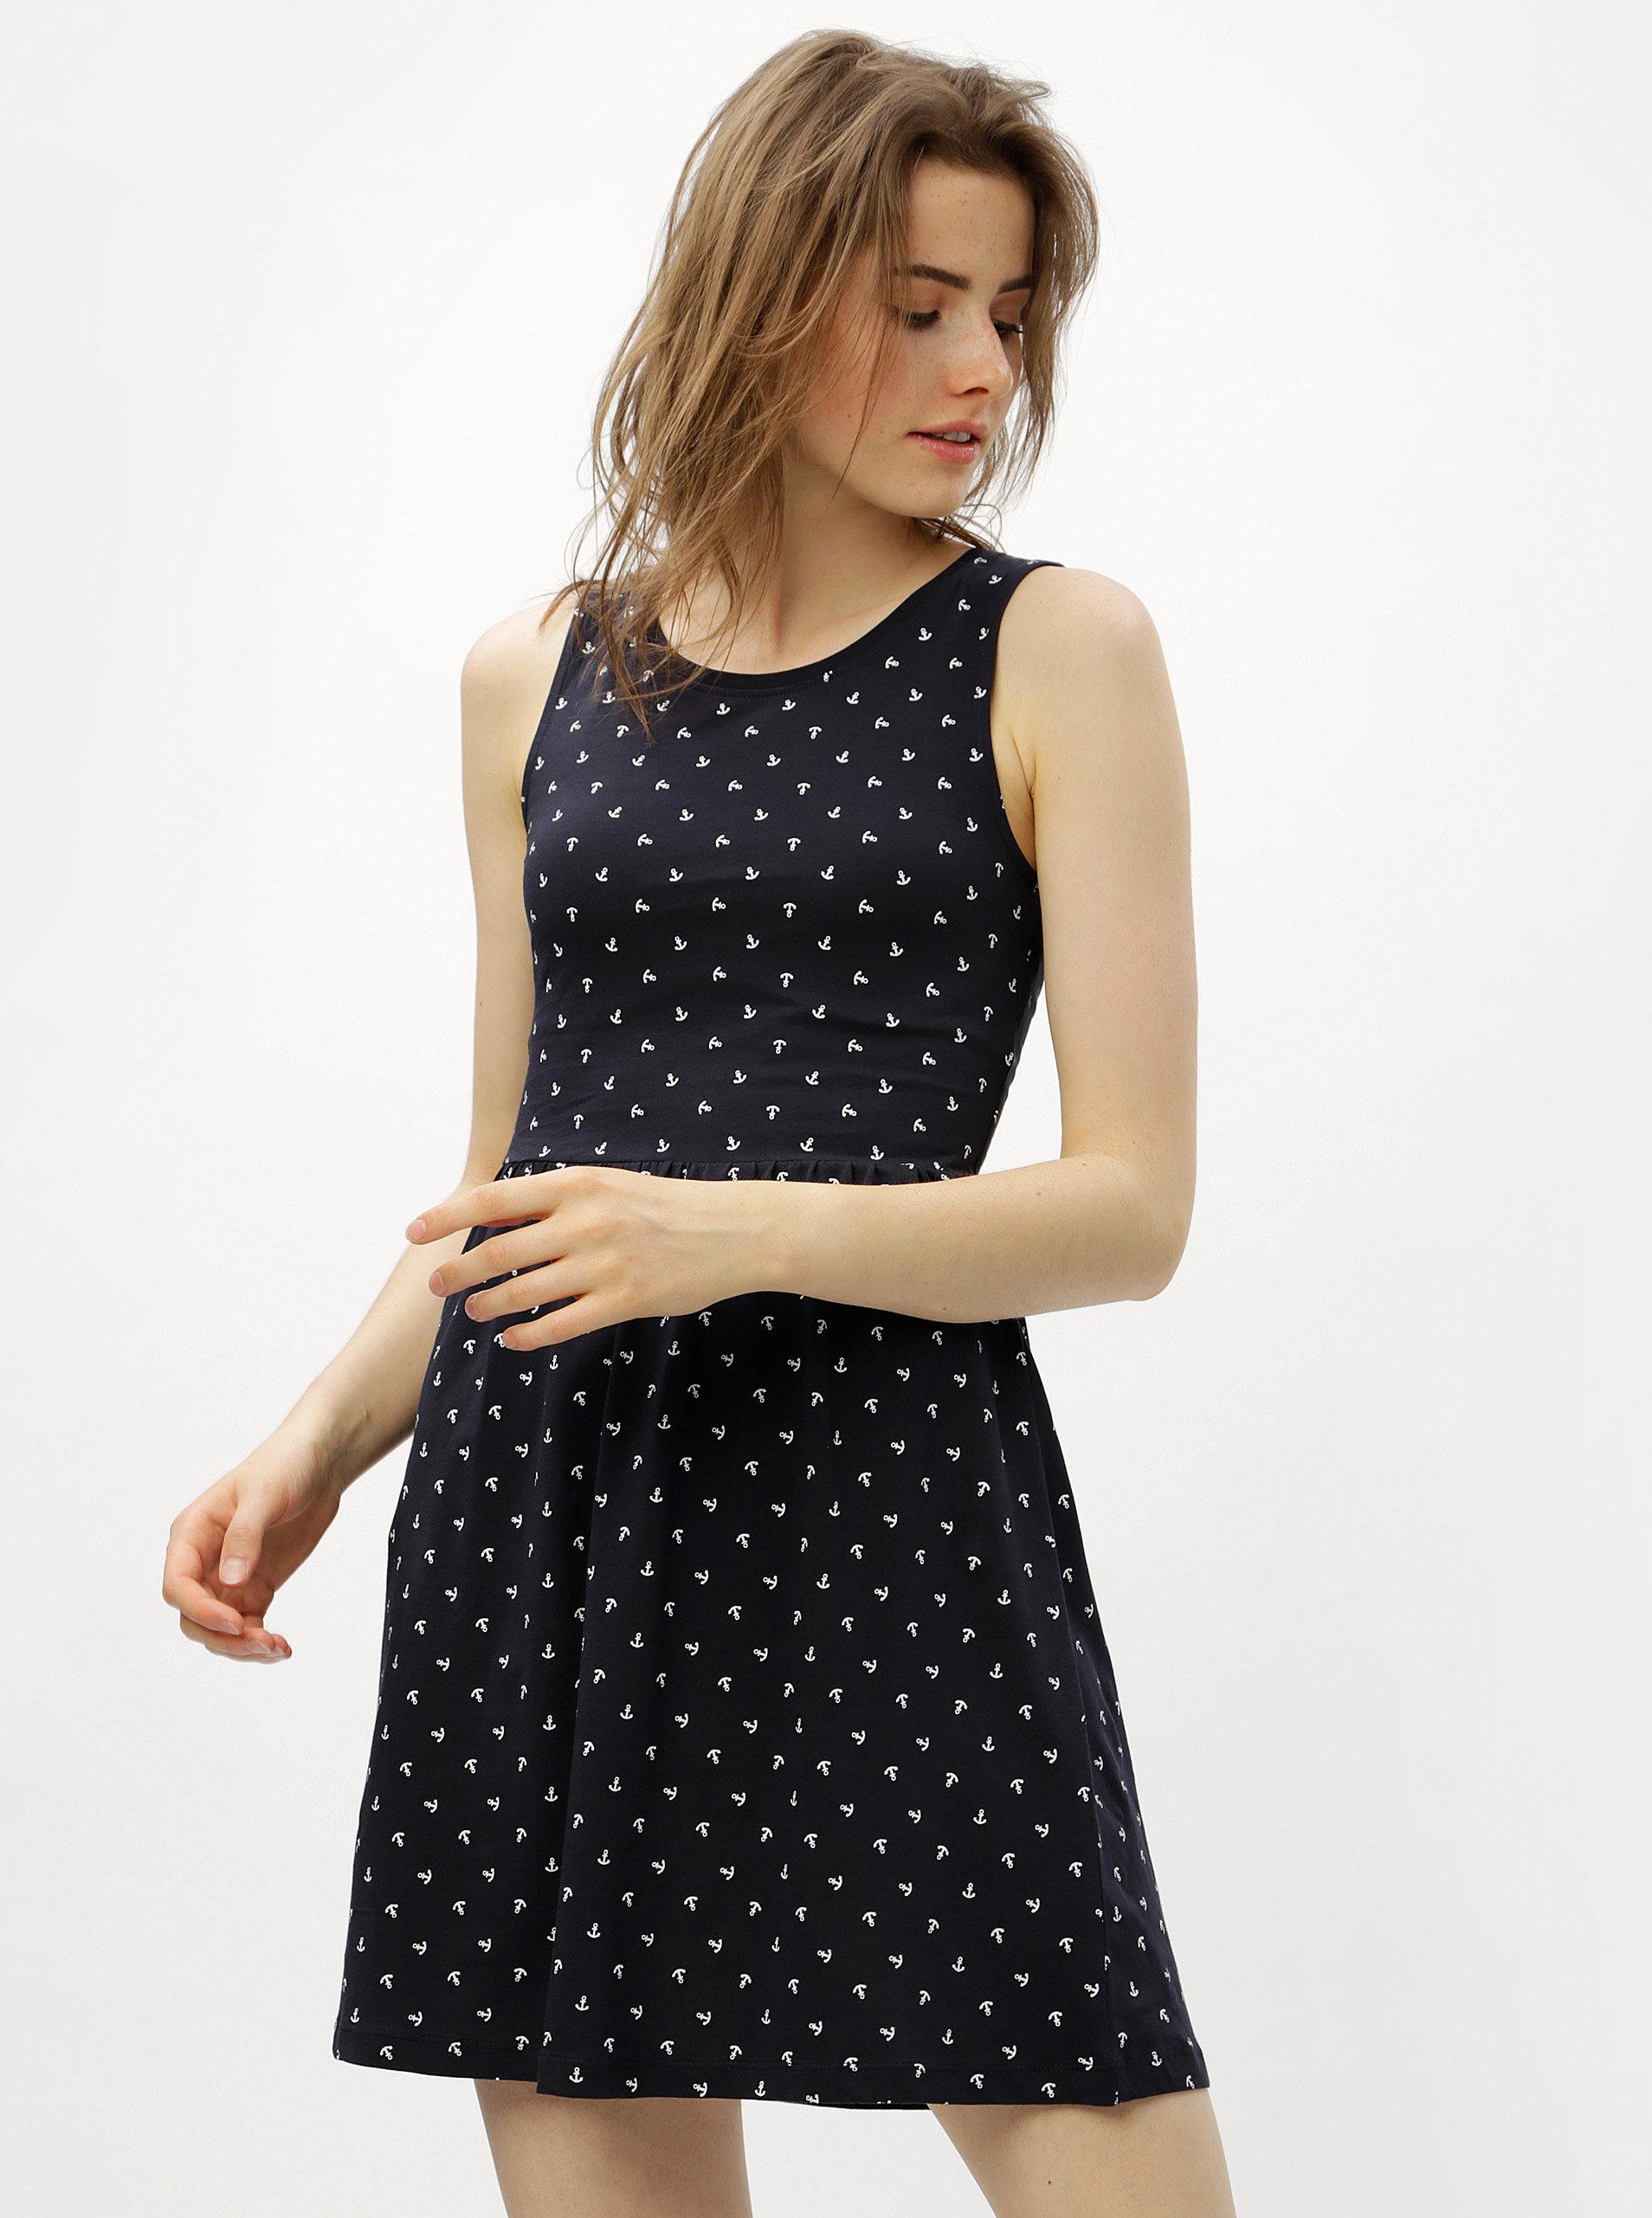 d54543c6981b Tmavomodré šaty s prestrihom na chrbte ONLY Olivia ...